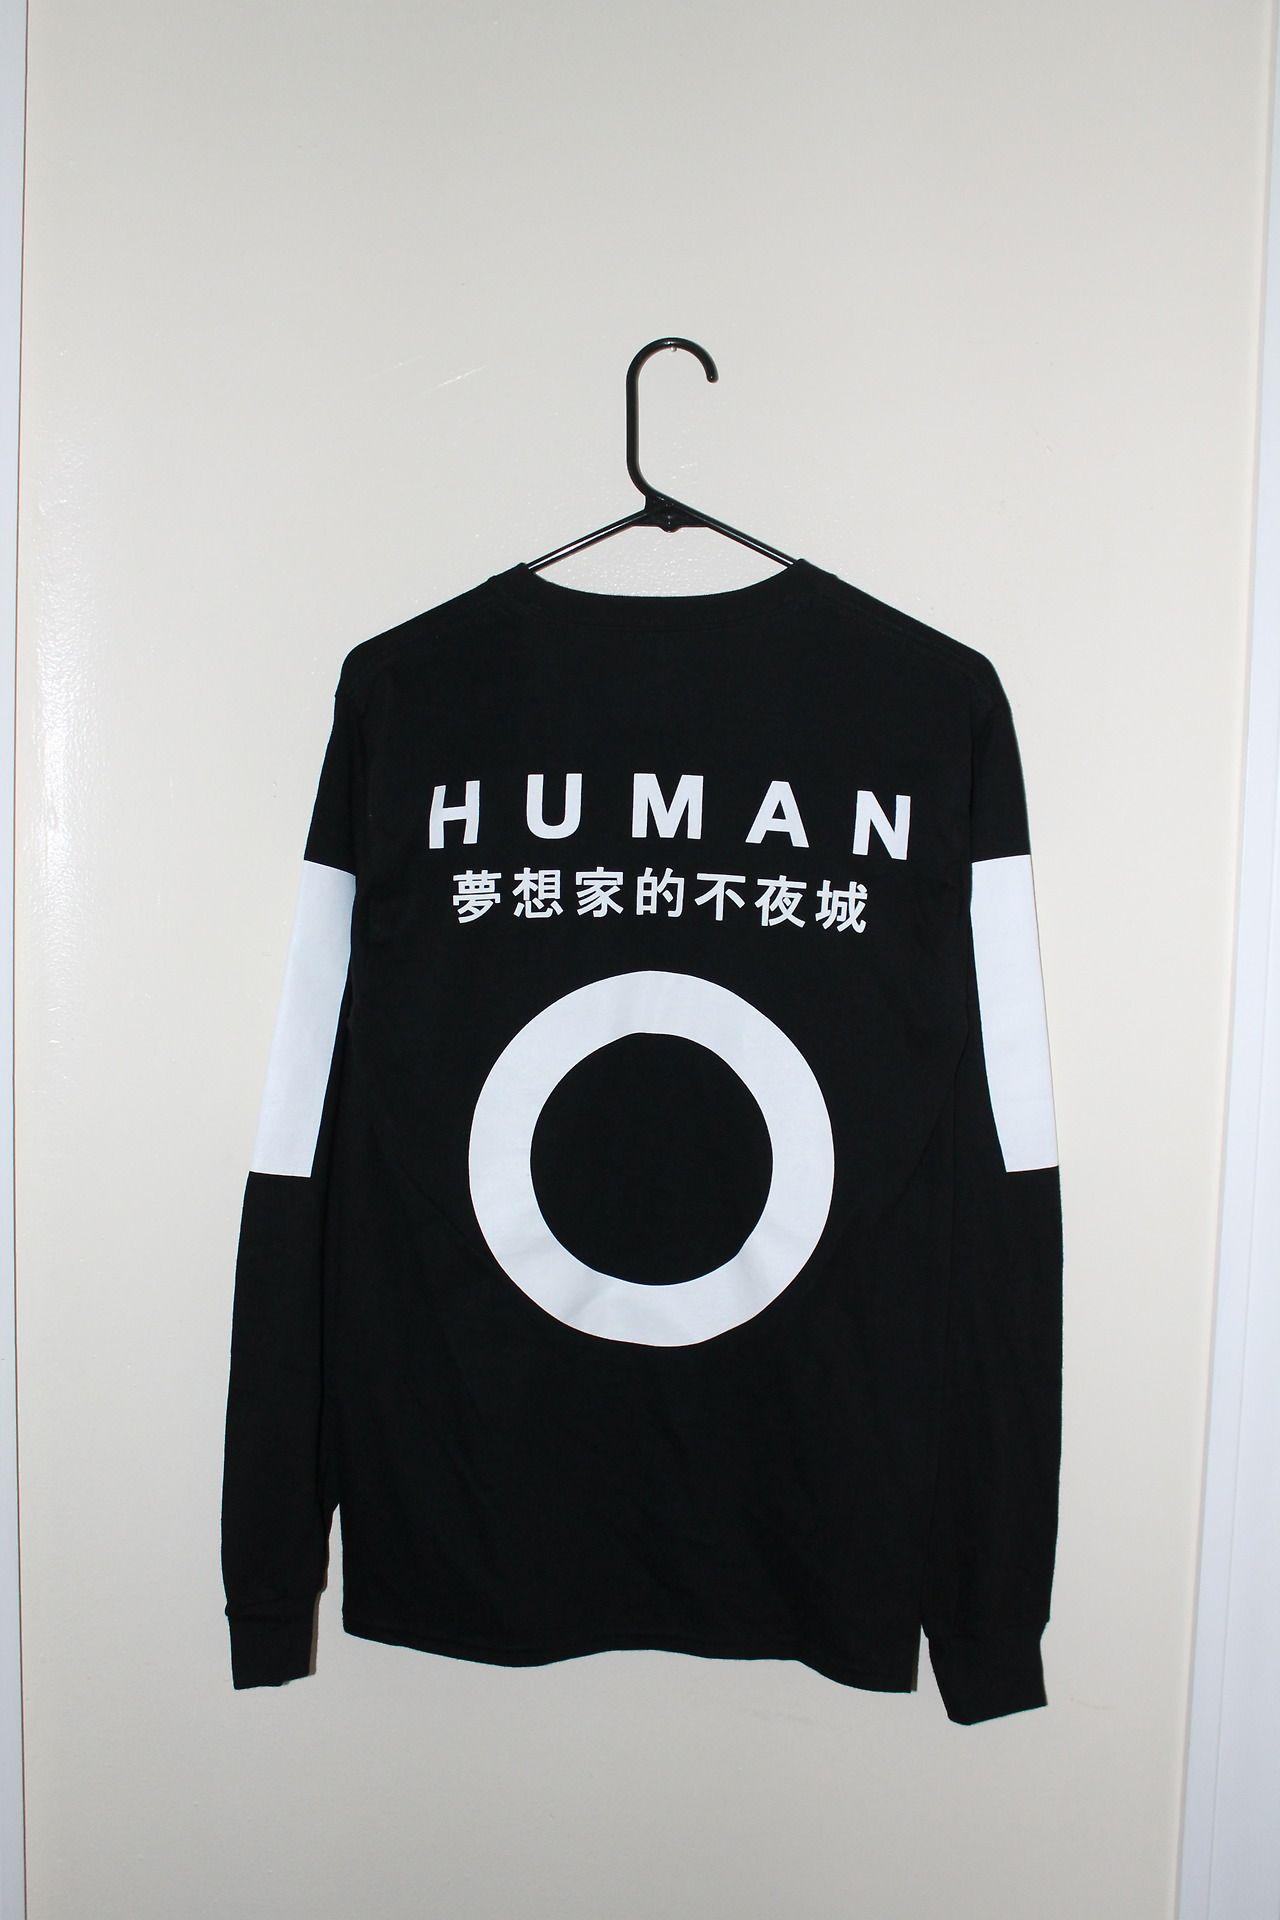 Human design t shirt - Humancollectiveus Dreamer That Never Sleeps L S T Shirt By Human